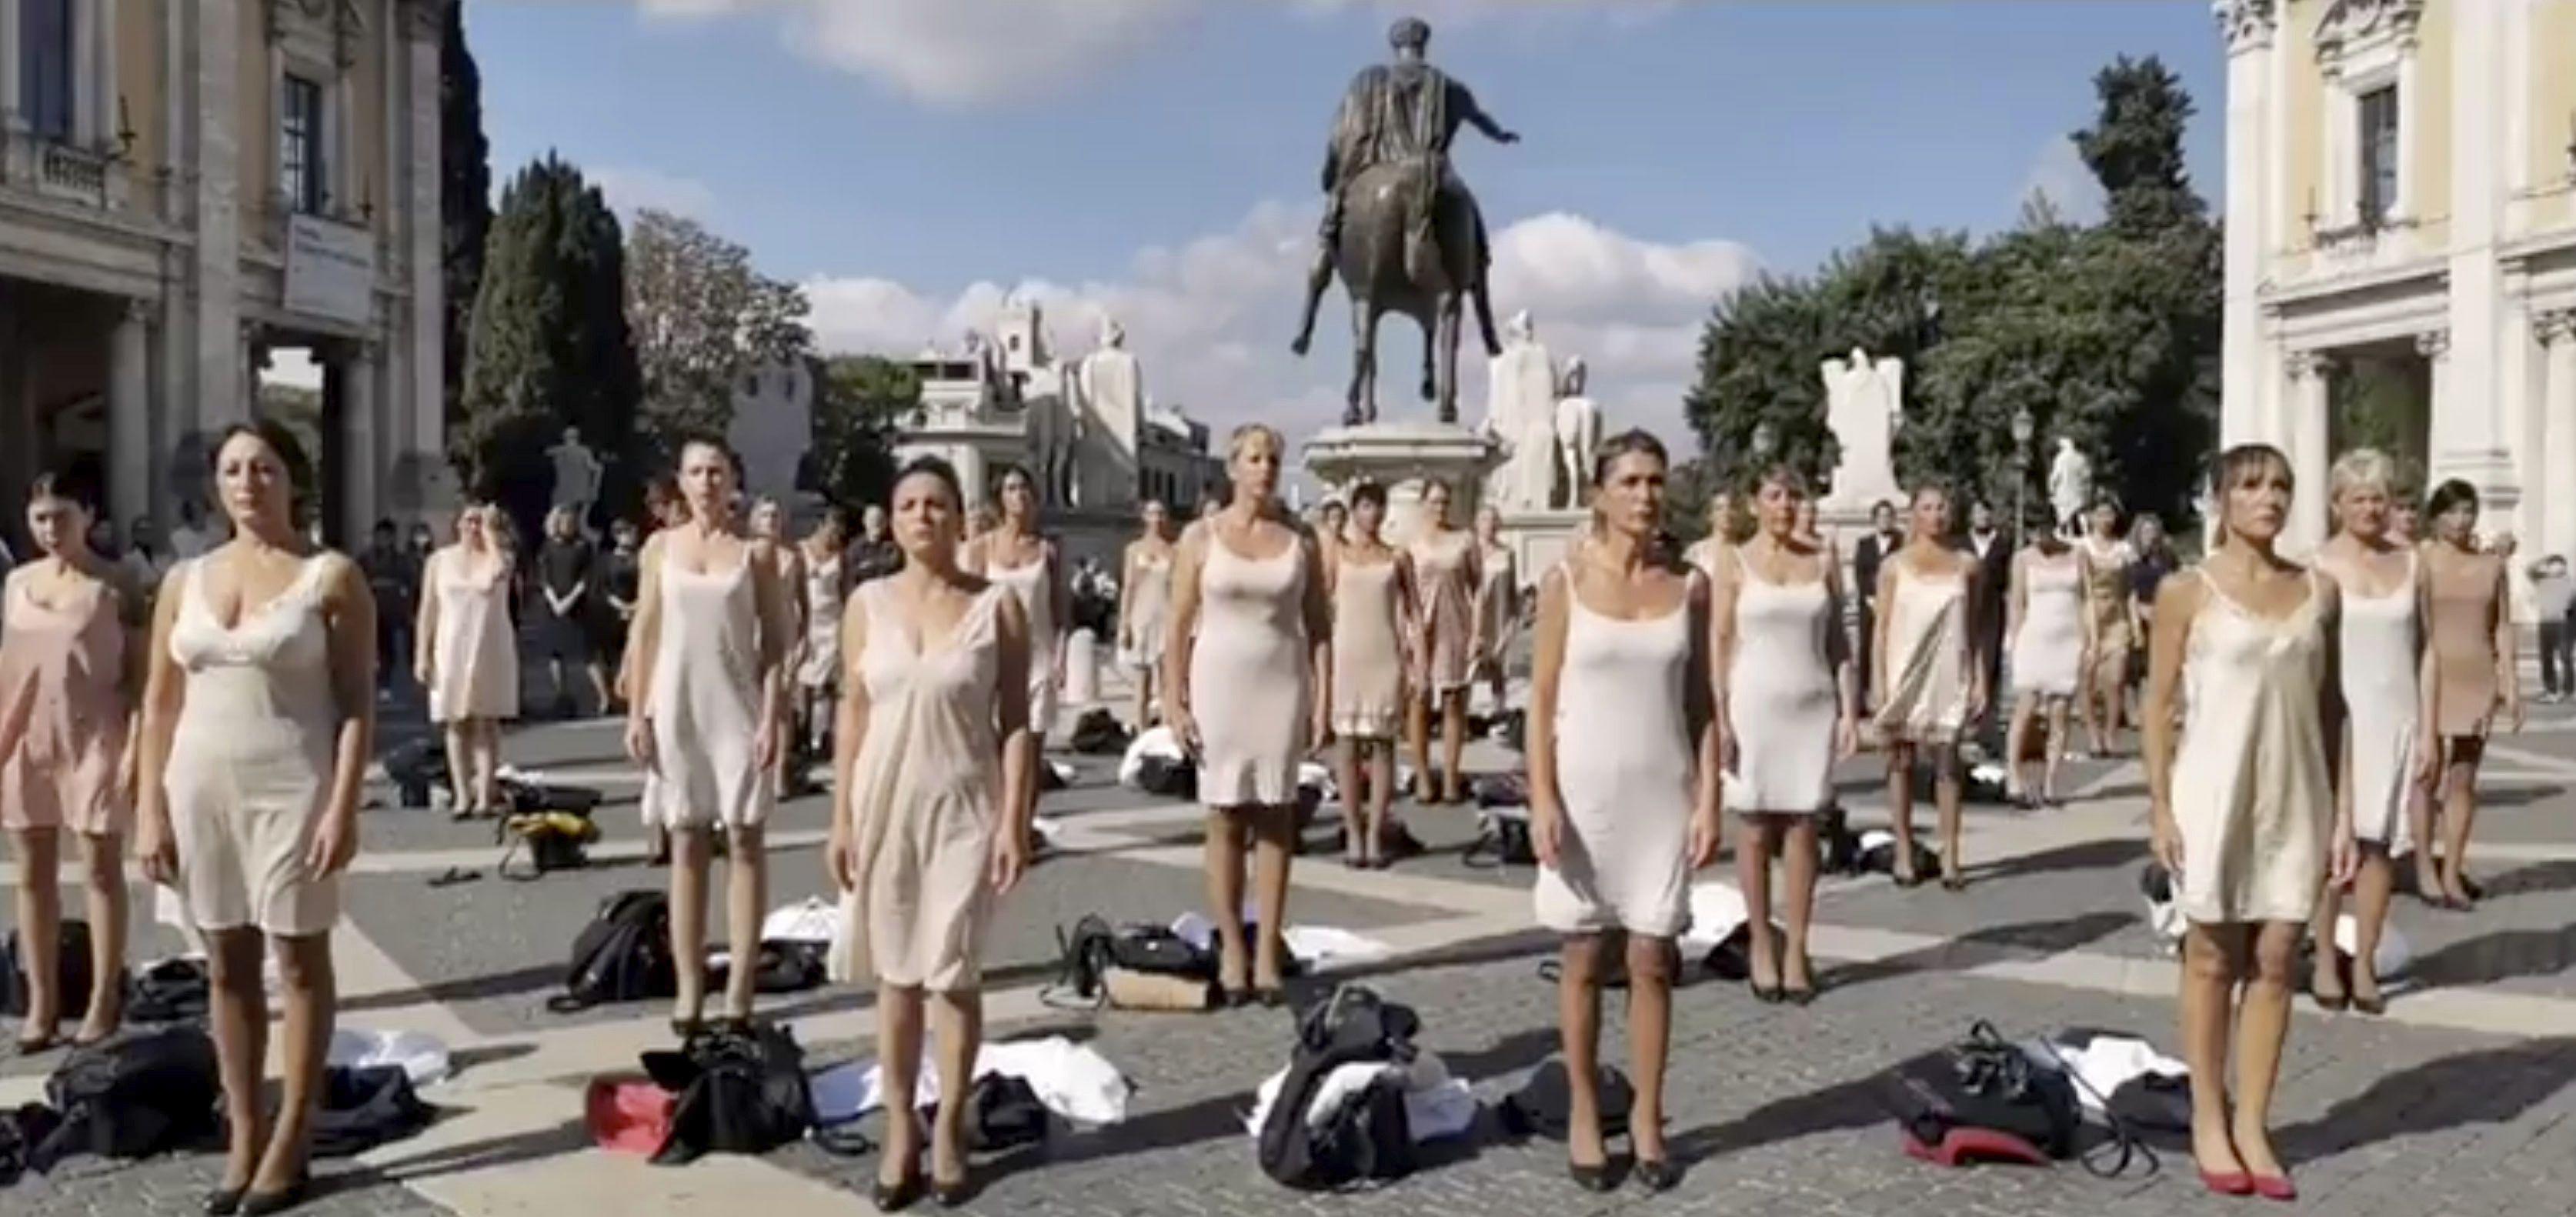 Sobrecargos de Alitalia protestan en ropa interior en Roma